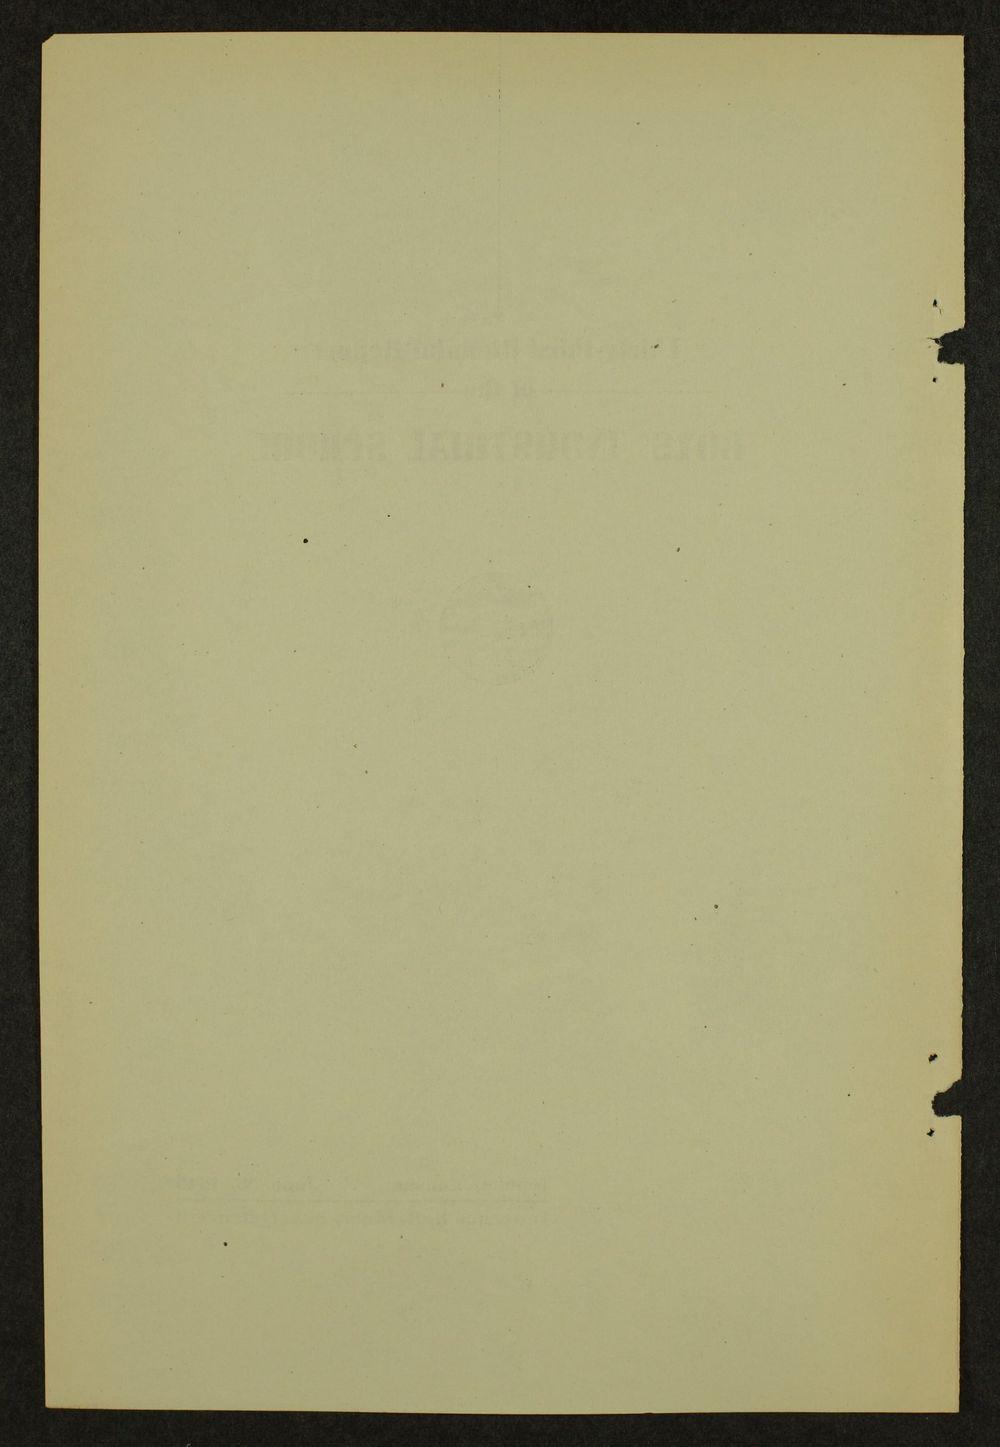 Biennial report of the Boys Industrial School, 1946 - 2